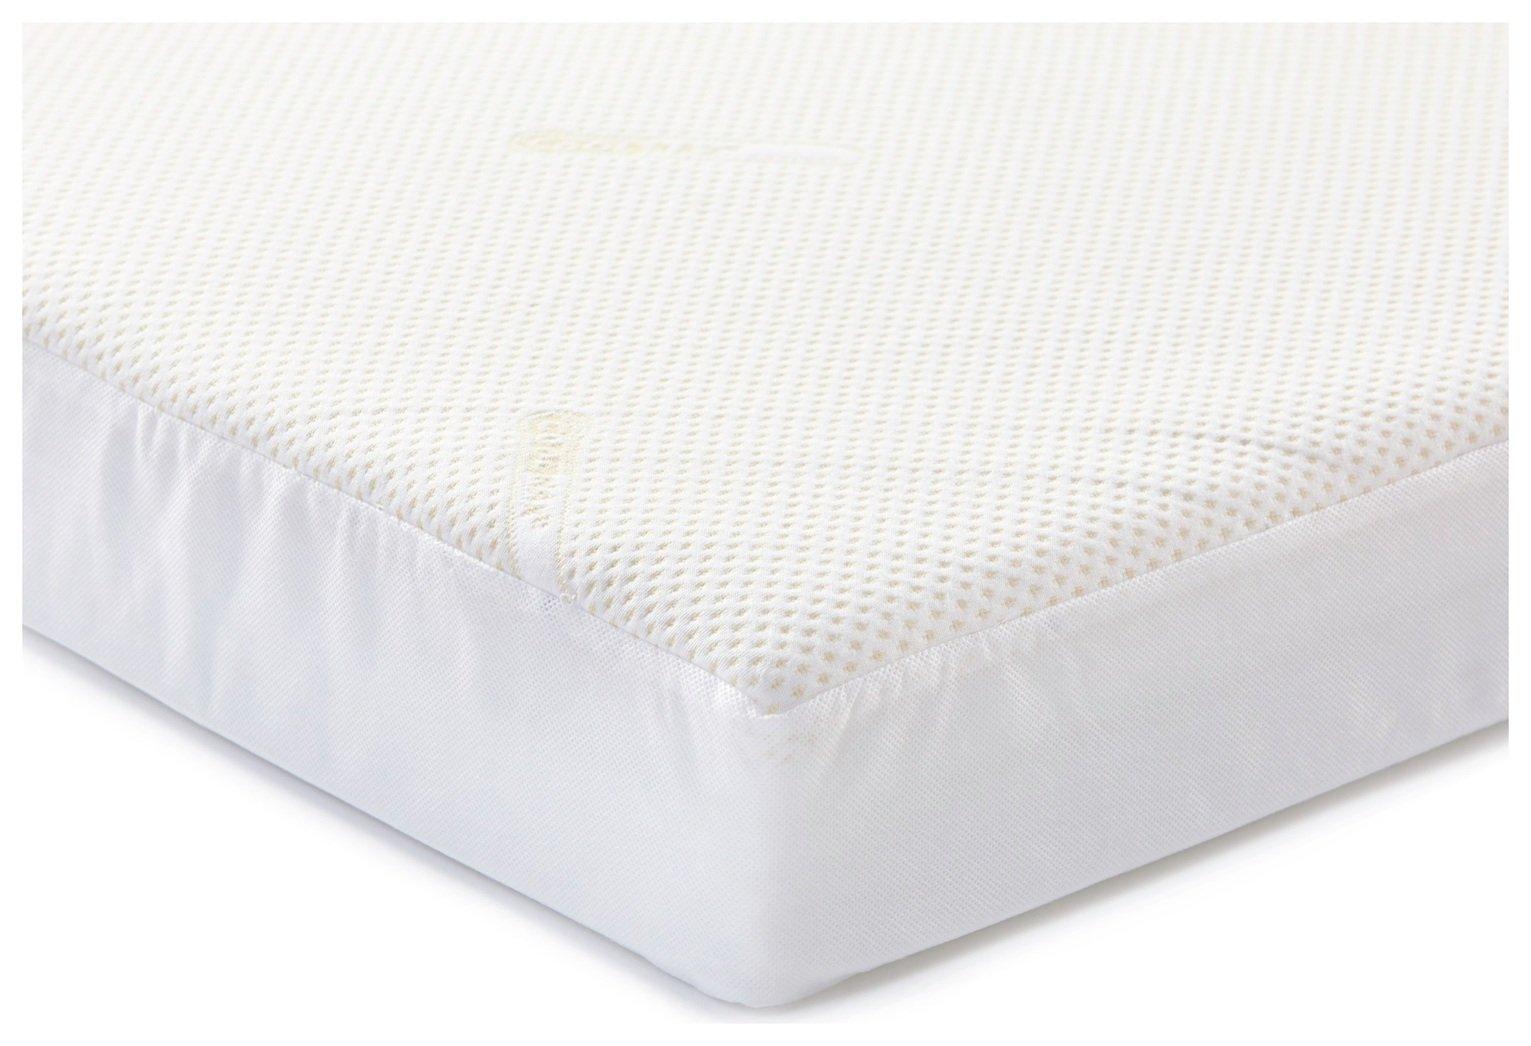 Baby elegance 120 x 60cm cool flow cot mattress